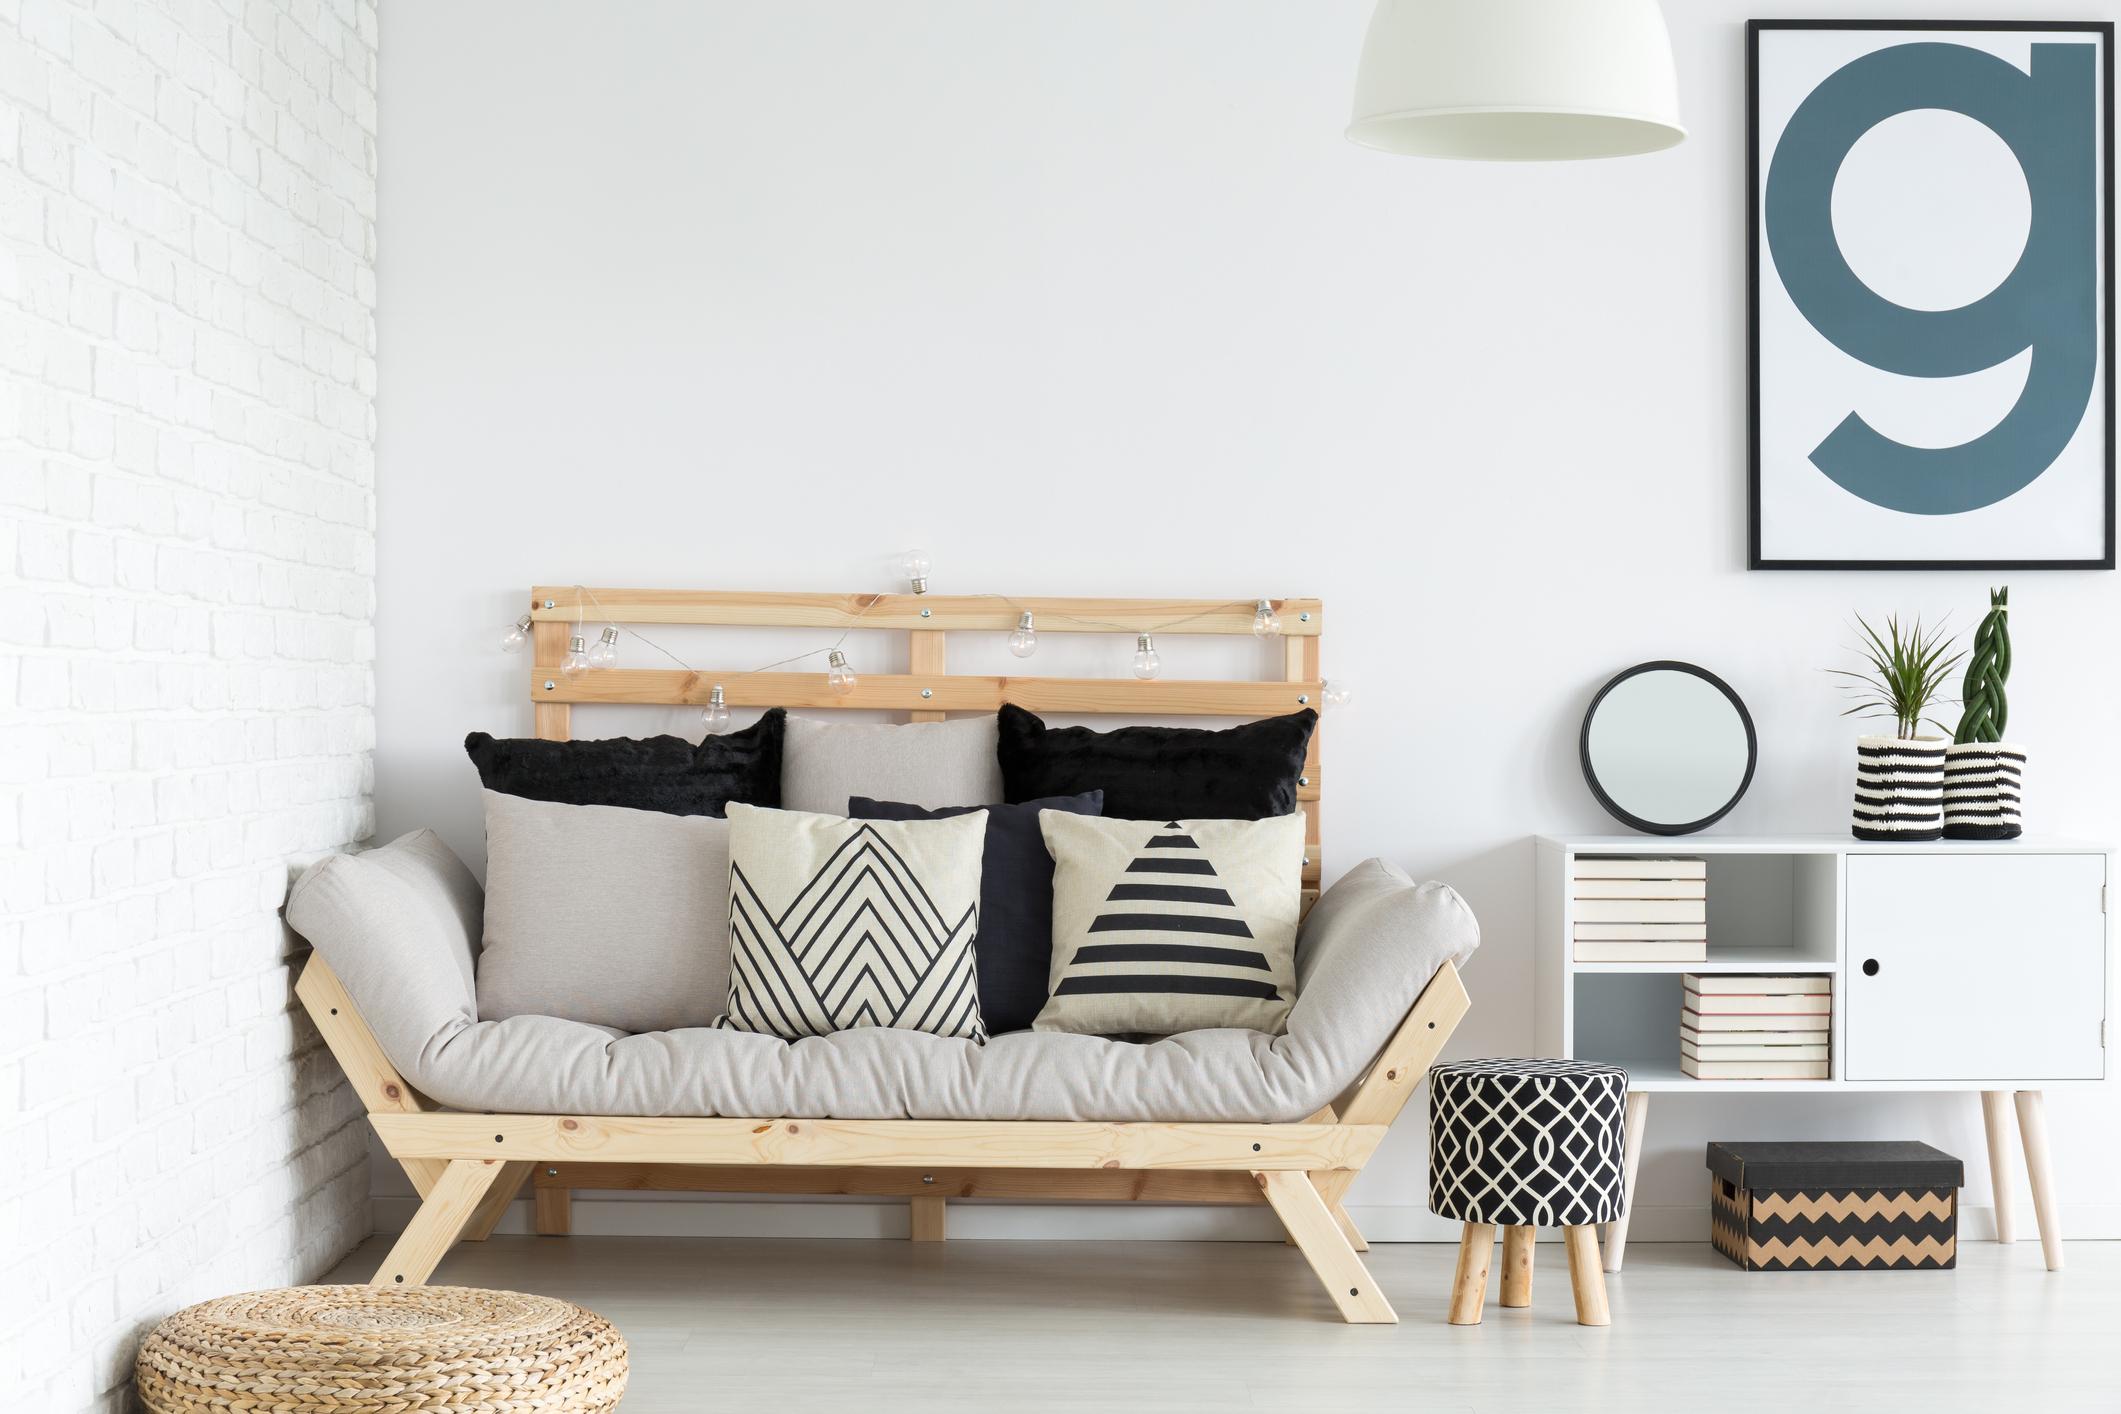 iStock-KatarzynaBialasiewicz Living room.jpg